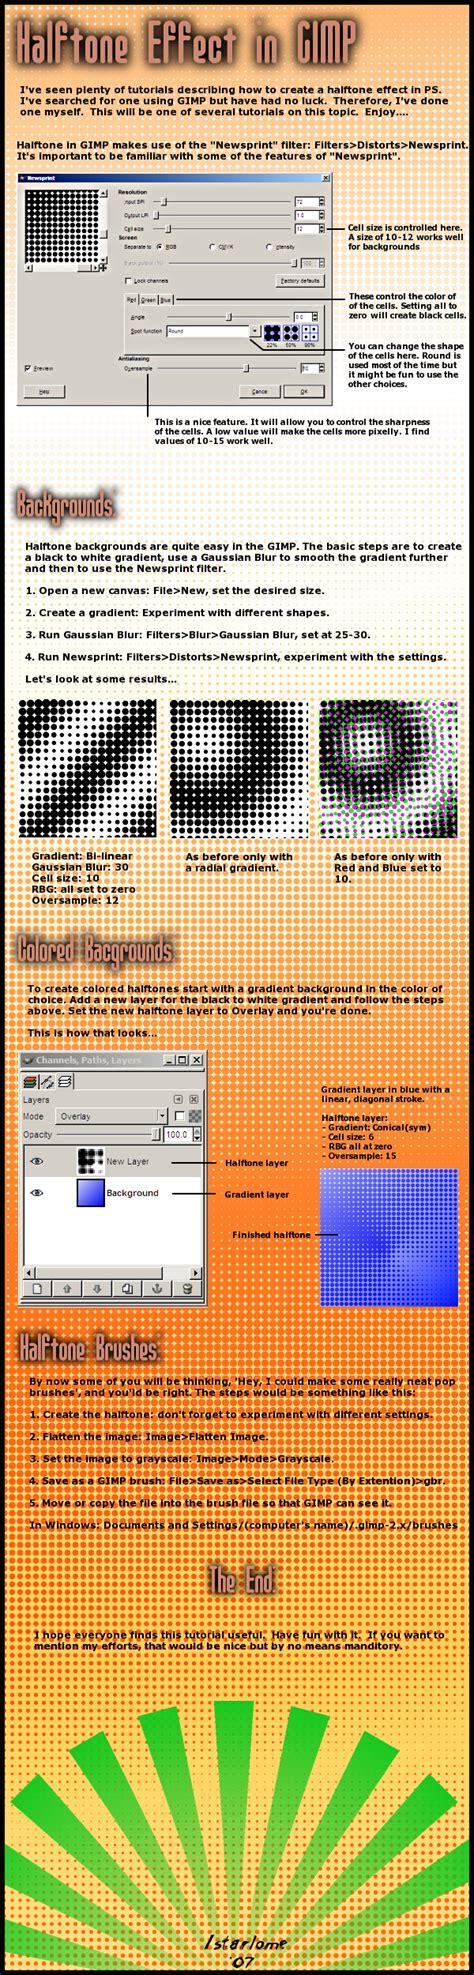 newsprint effect basics gimp by tgfcoder on deviantart halftone effect in gimp by istarlome on deviantart